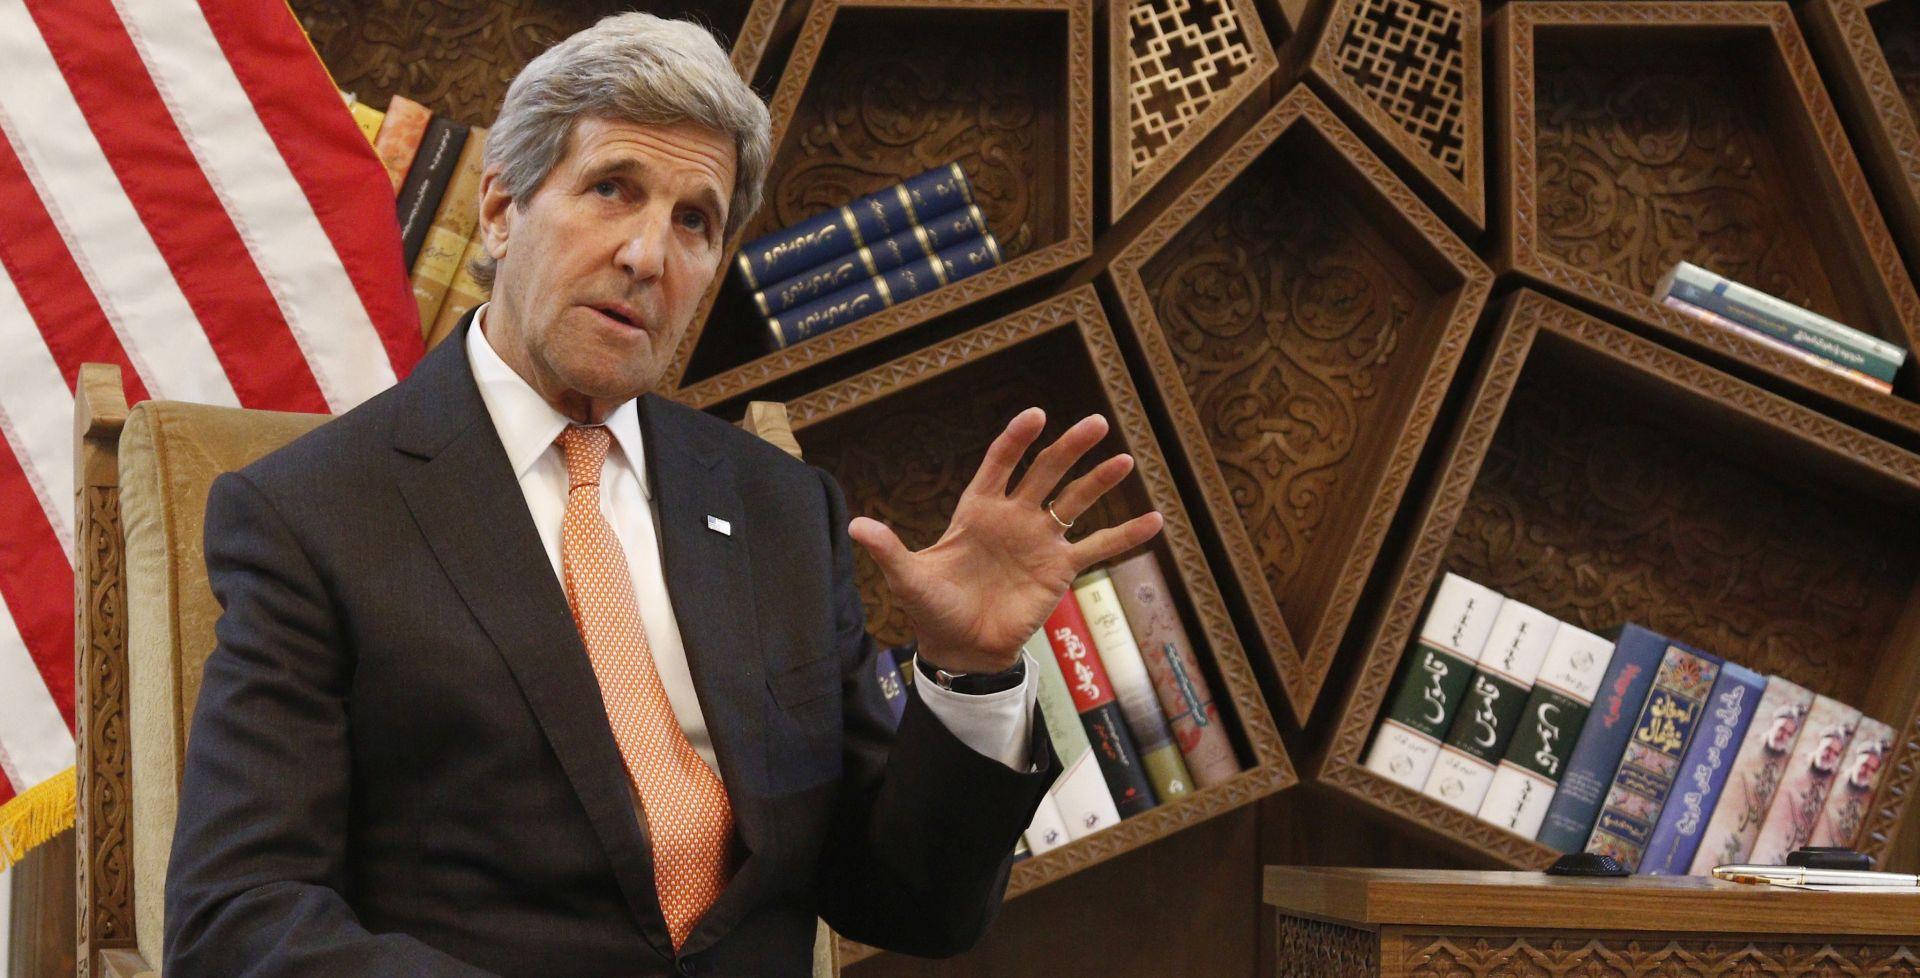 State Department upozorava na globalnu krizu ljudskih prava